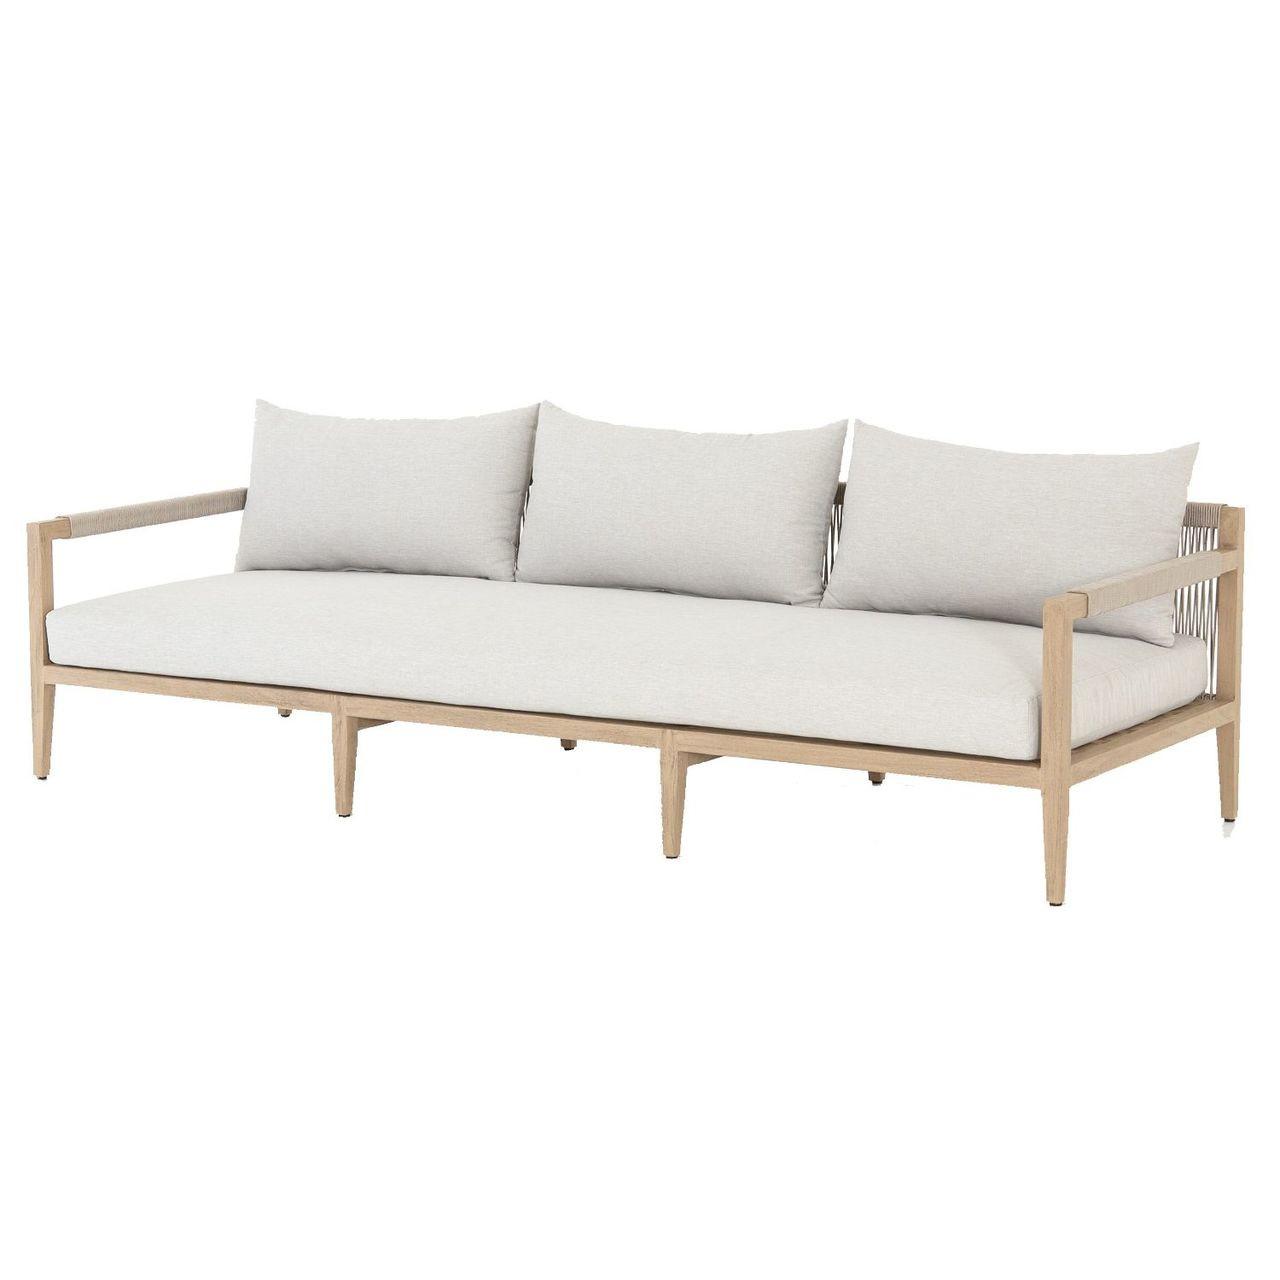 Sherwood Natural Teak Outdoor 3 Seater Sofa 93\